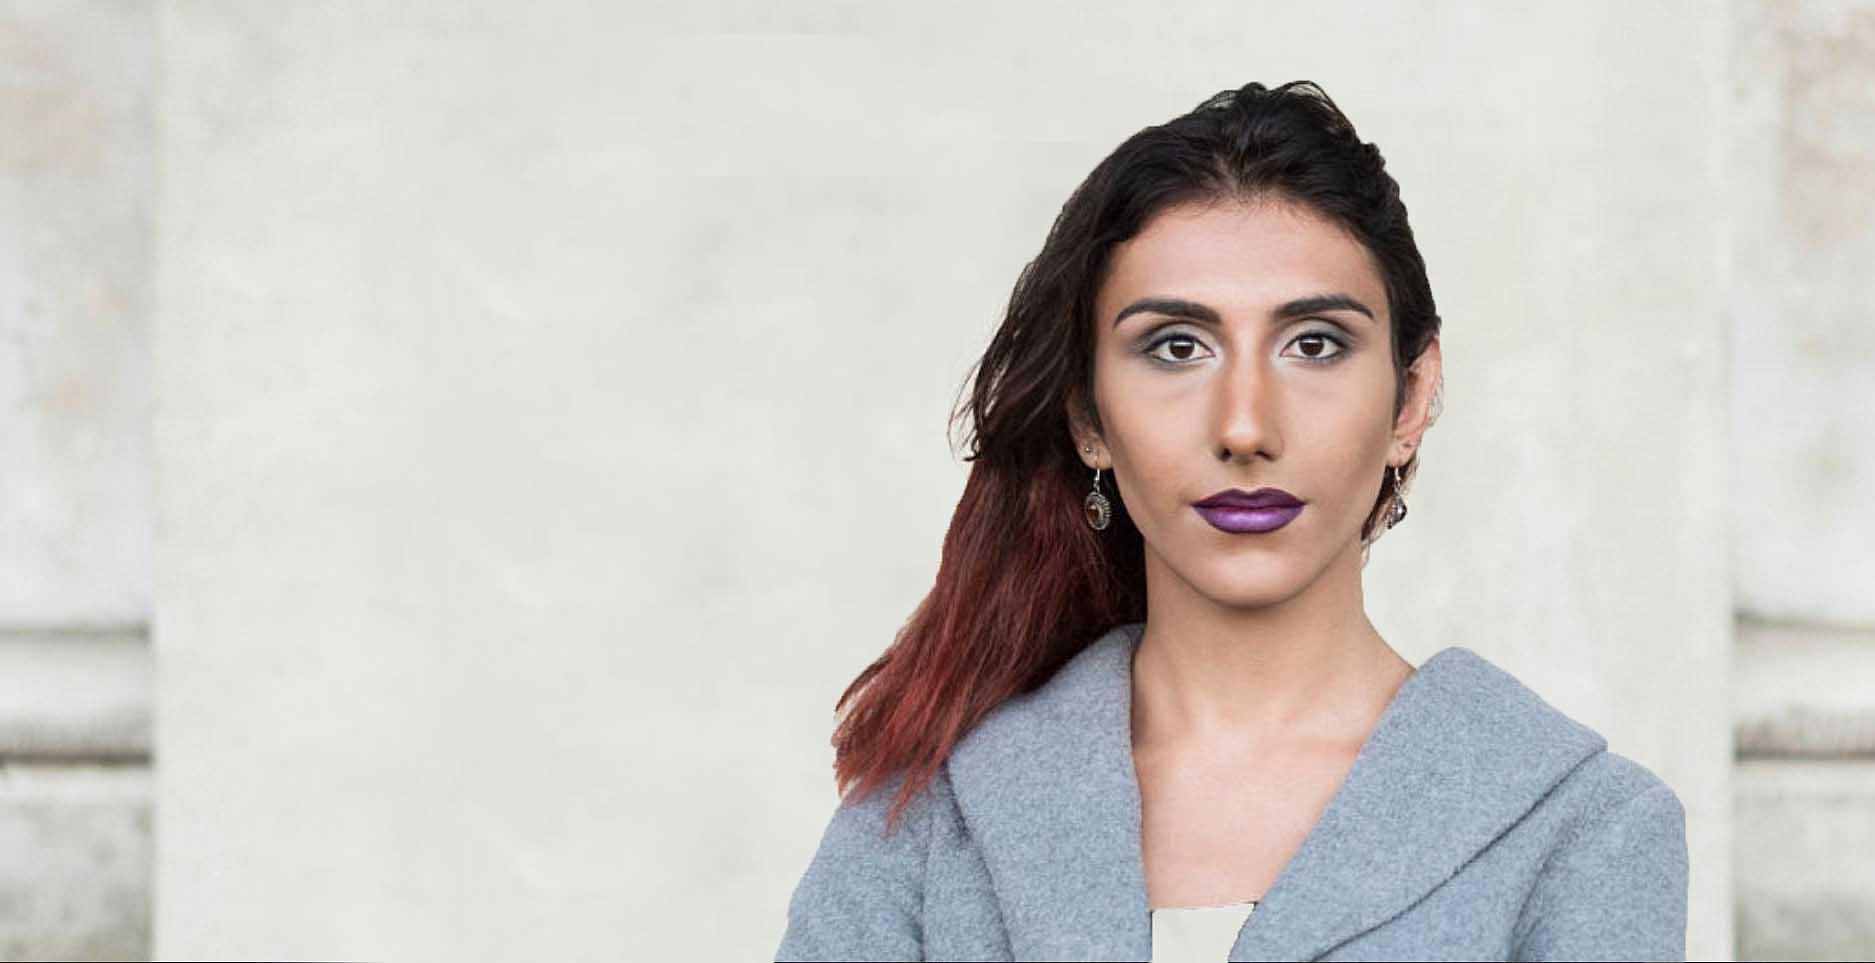 Facial feminization surgery in Spain